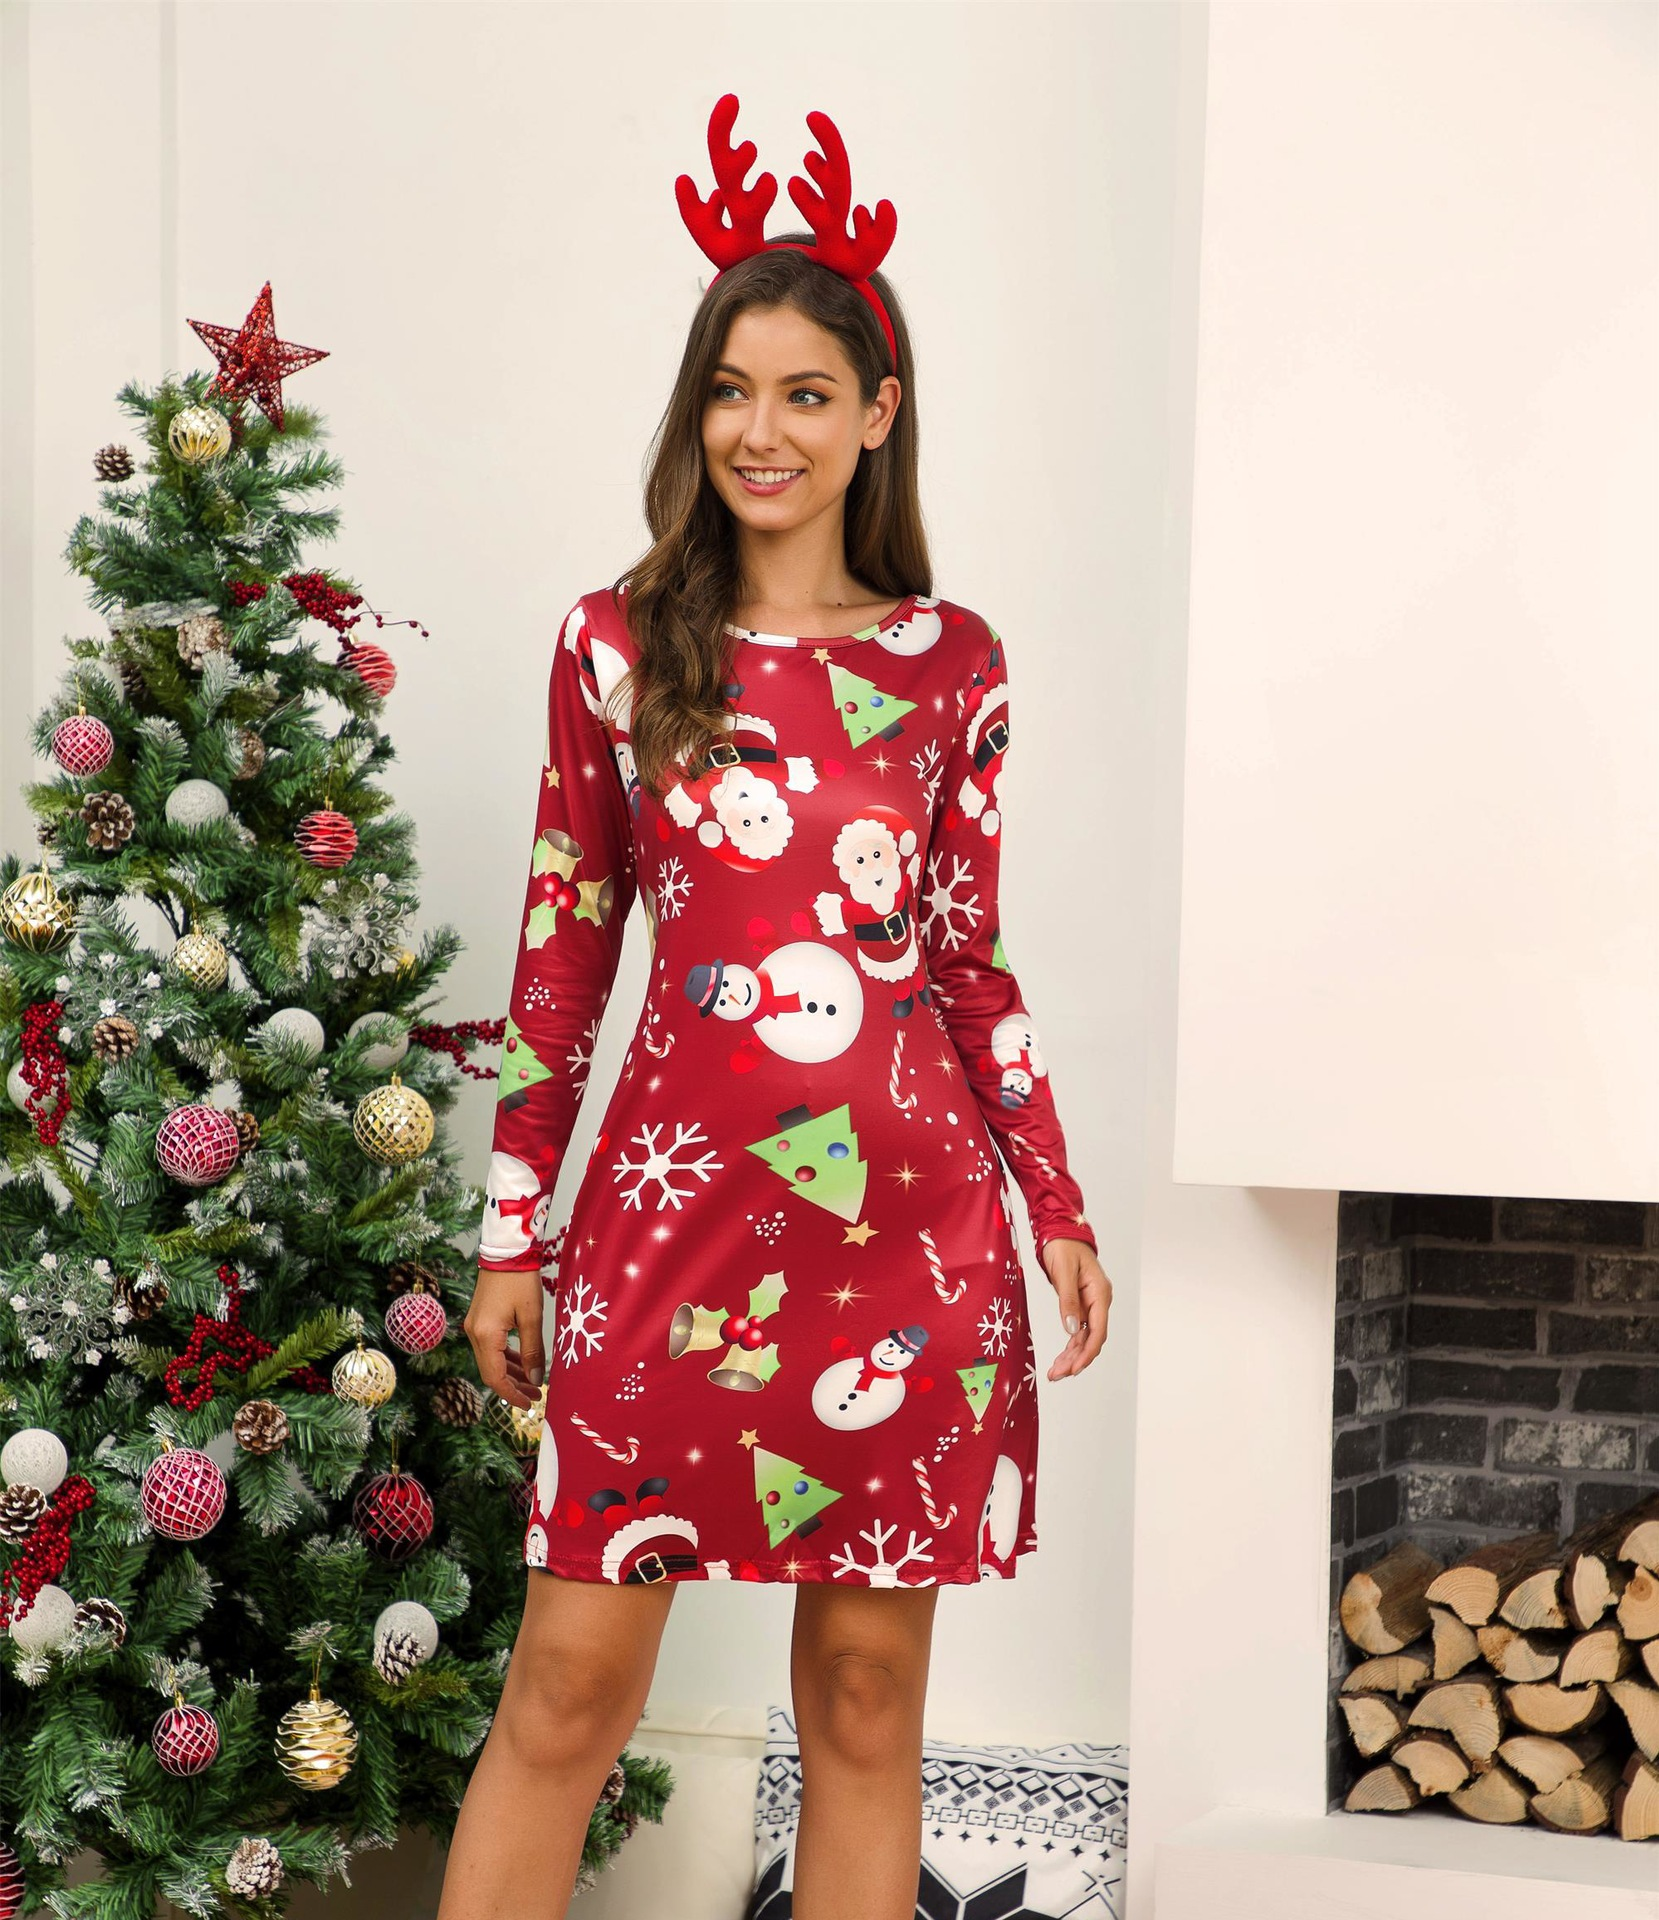 Santa Claus Vintage Dresses Christmas Clothes Plus Size Women Gothic 2019 Print Casual Deer Party Dress Christmas Tree